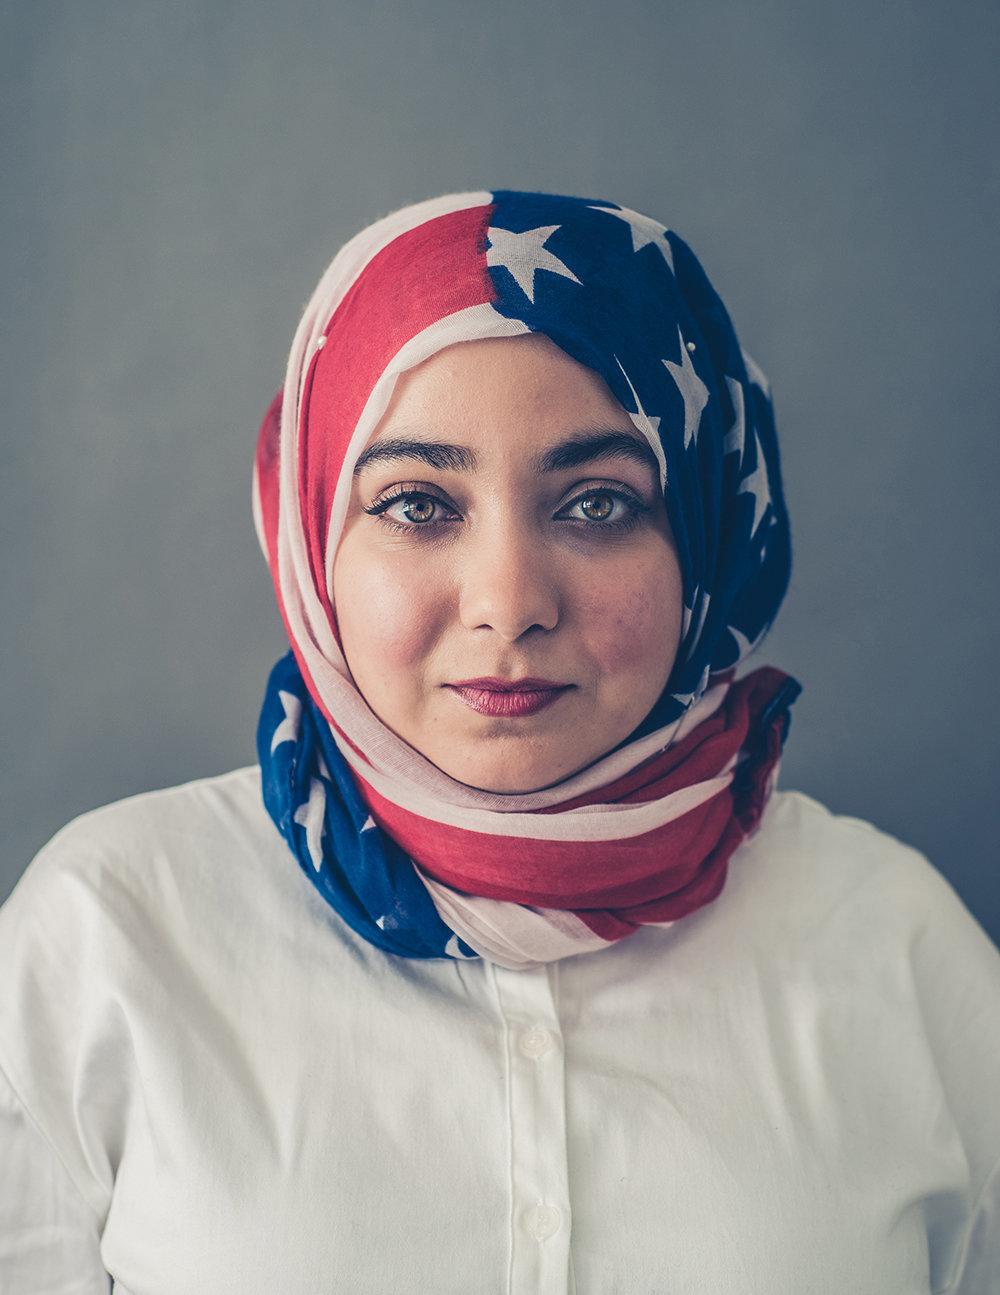 Photographer Combats Trump's Islamophobia With Stunning Portrait